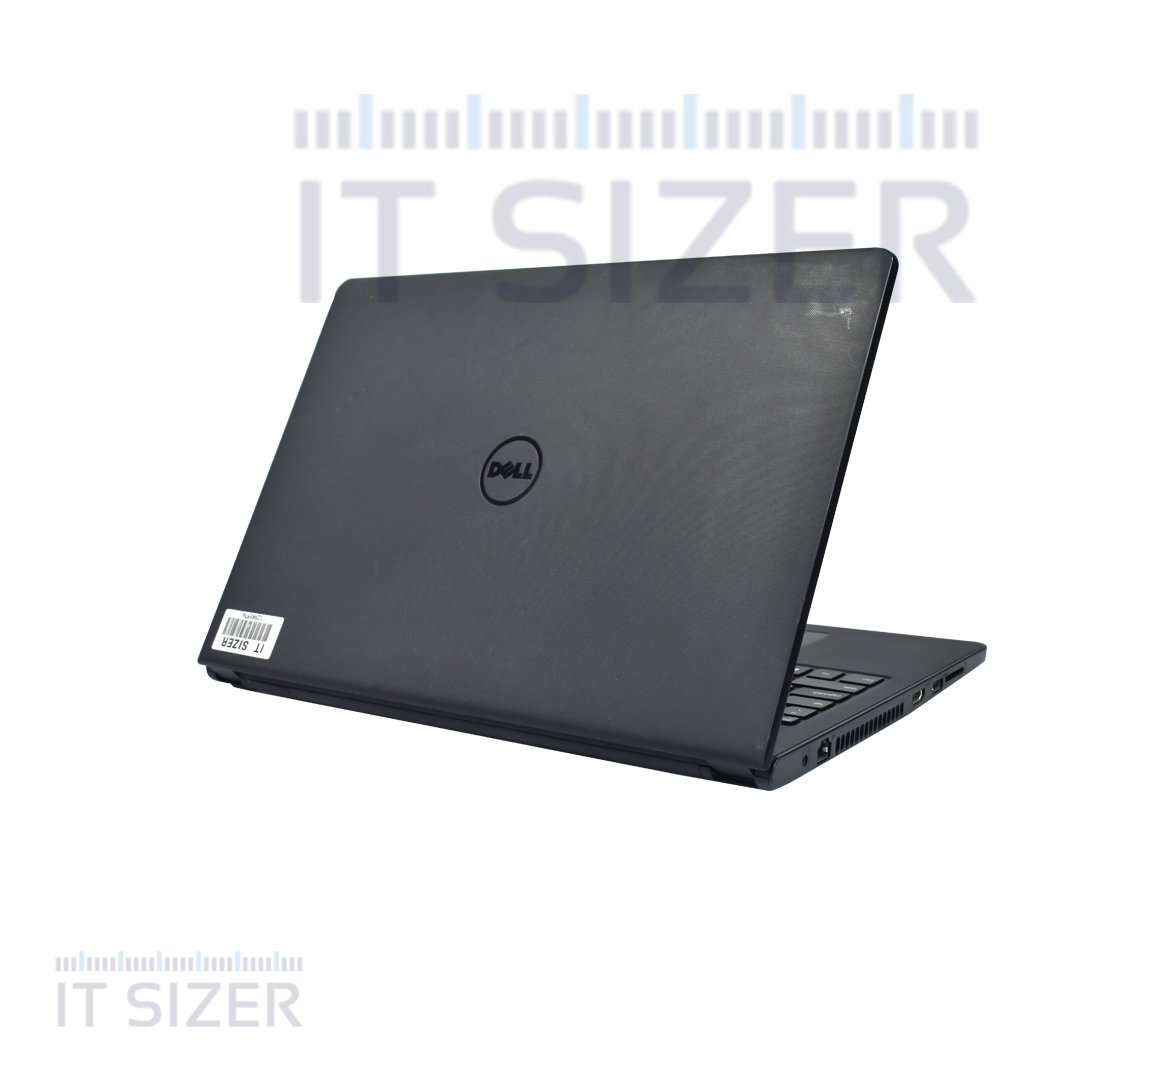 Dell Inspiron 3558 Business Laptop, Intel Core i3-5015U @ 2.10GHZ CPU, 8GB DDR3L SODIMM RAM, 256GB SSD 2.5 , 15 inch Display, Windows 10 Pro (Renewed)